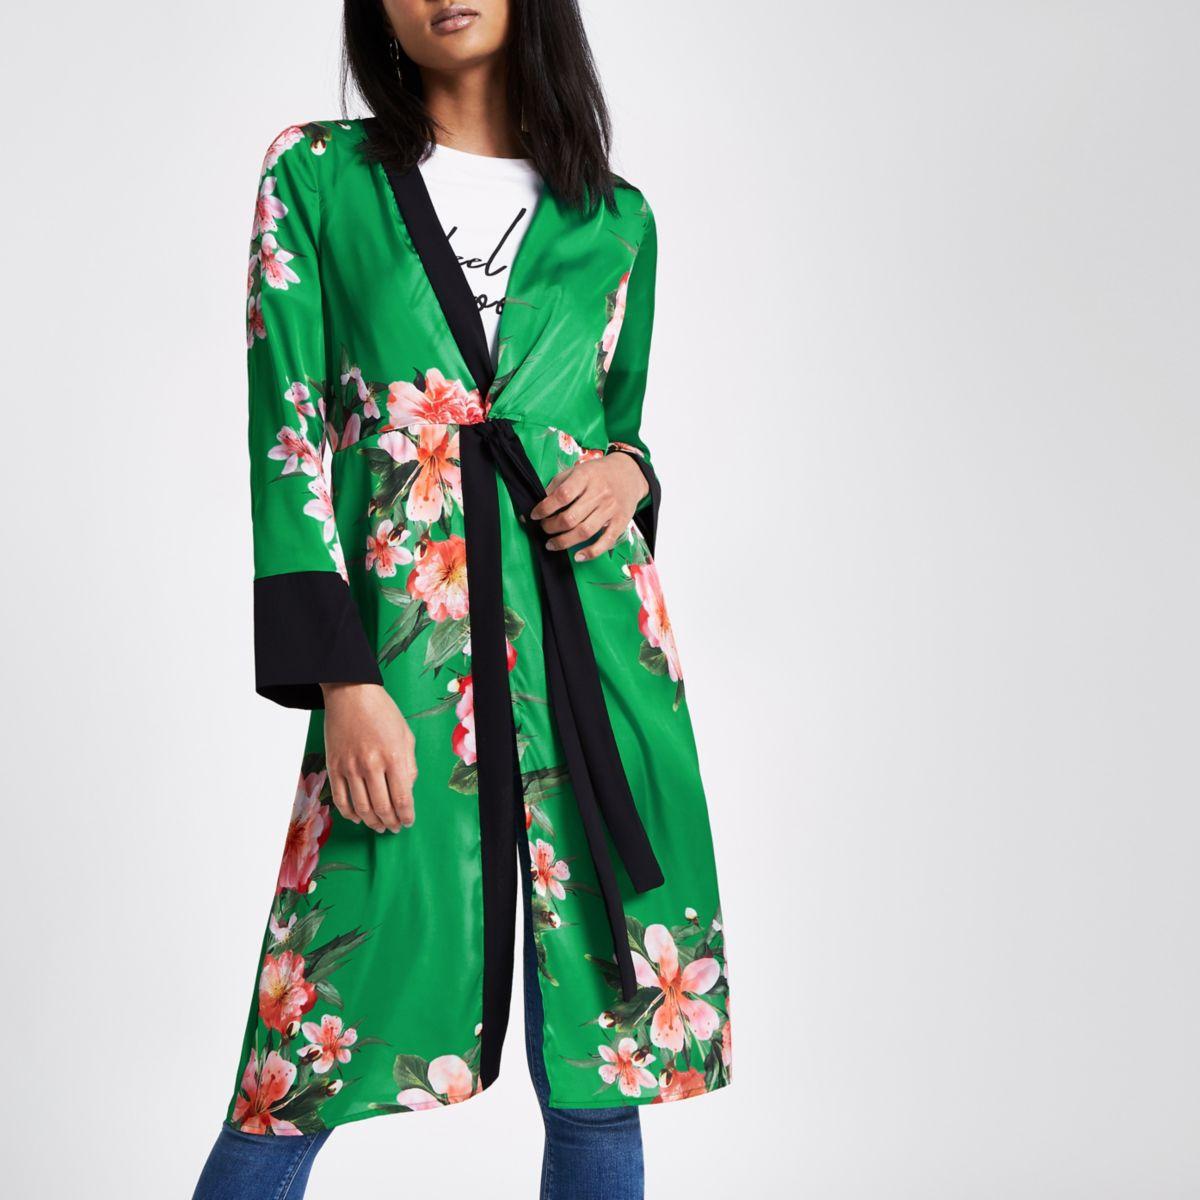 Green floral print twist front kimono